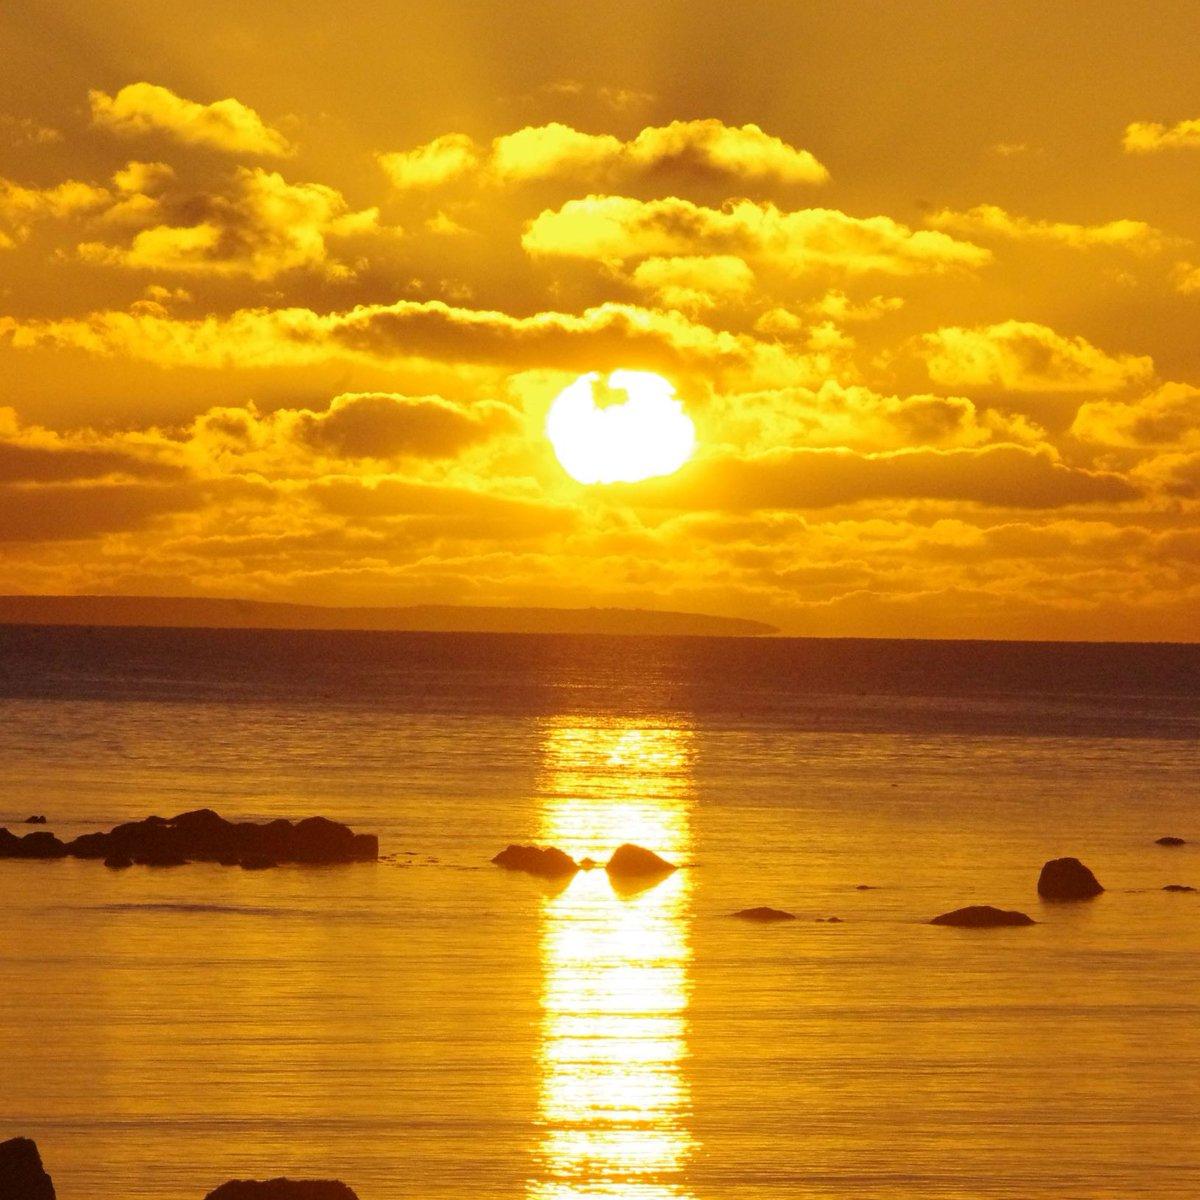 Found an old photograph of a beautiful #sunset at #Furbo #beach #Galway a few year's back #inspiration #connemara #wildatlanticway #hope #ireland